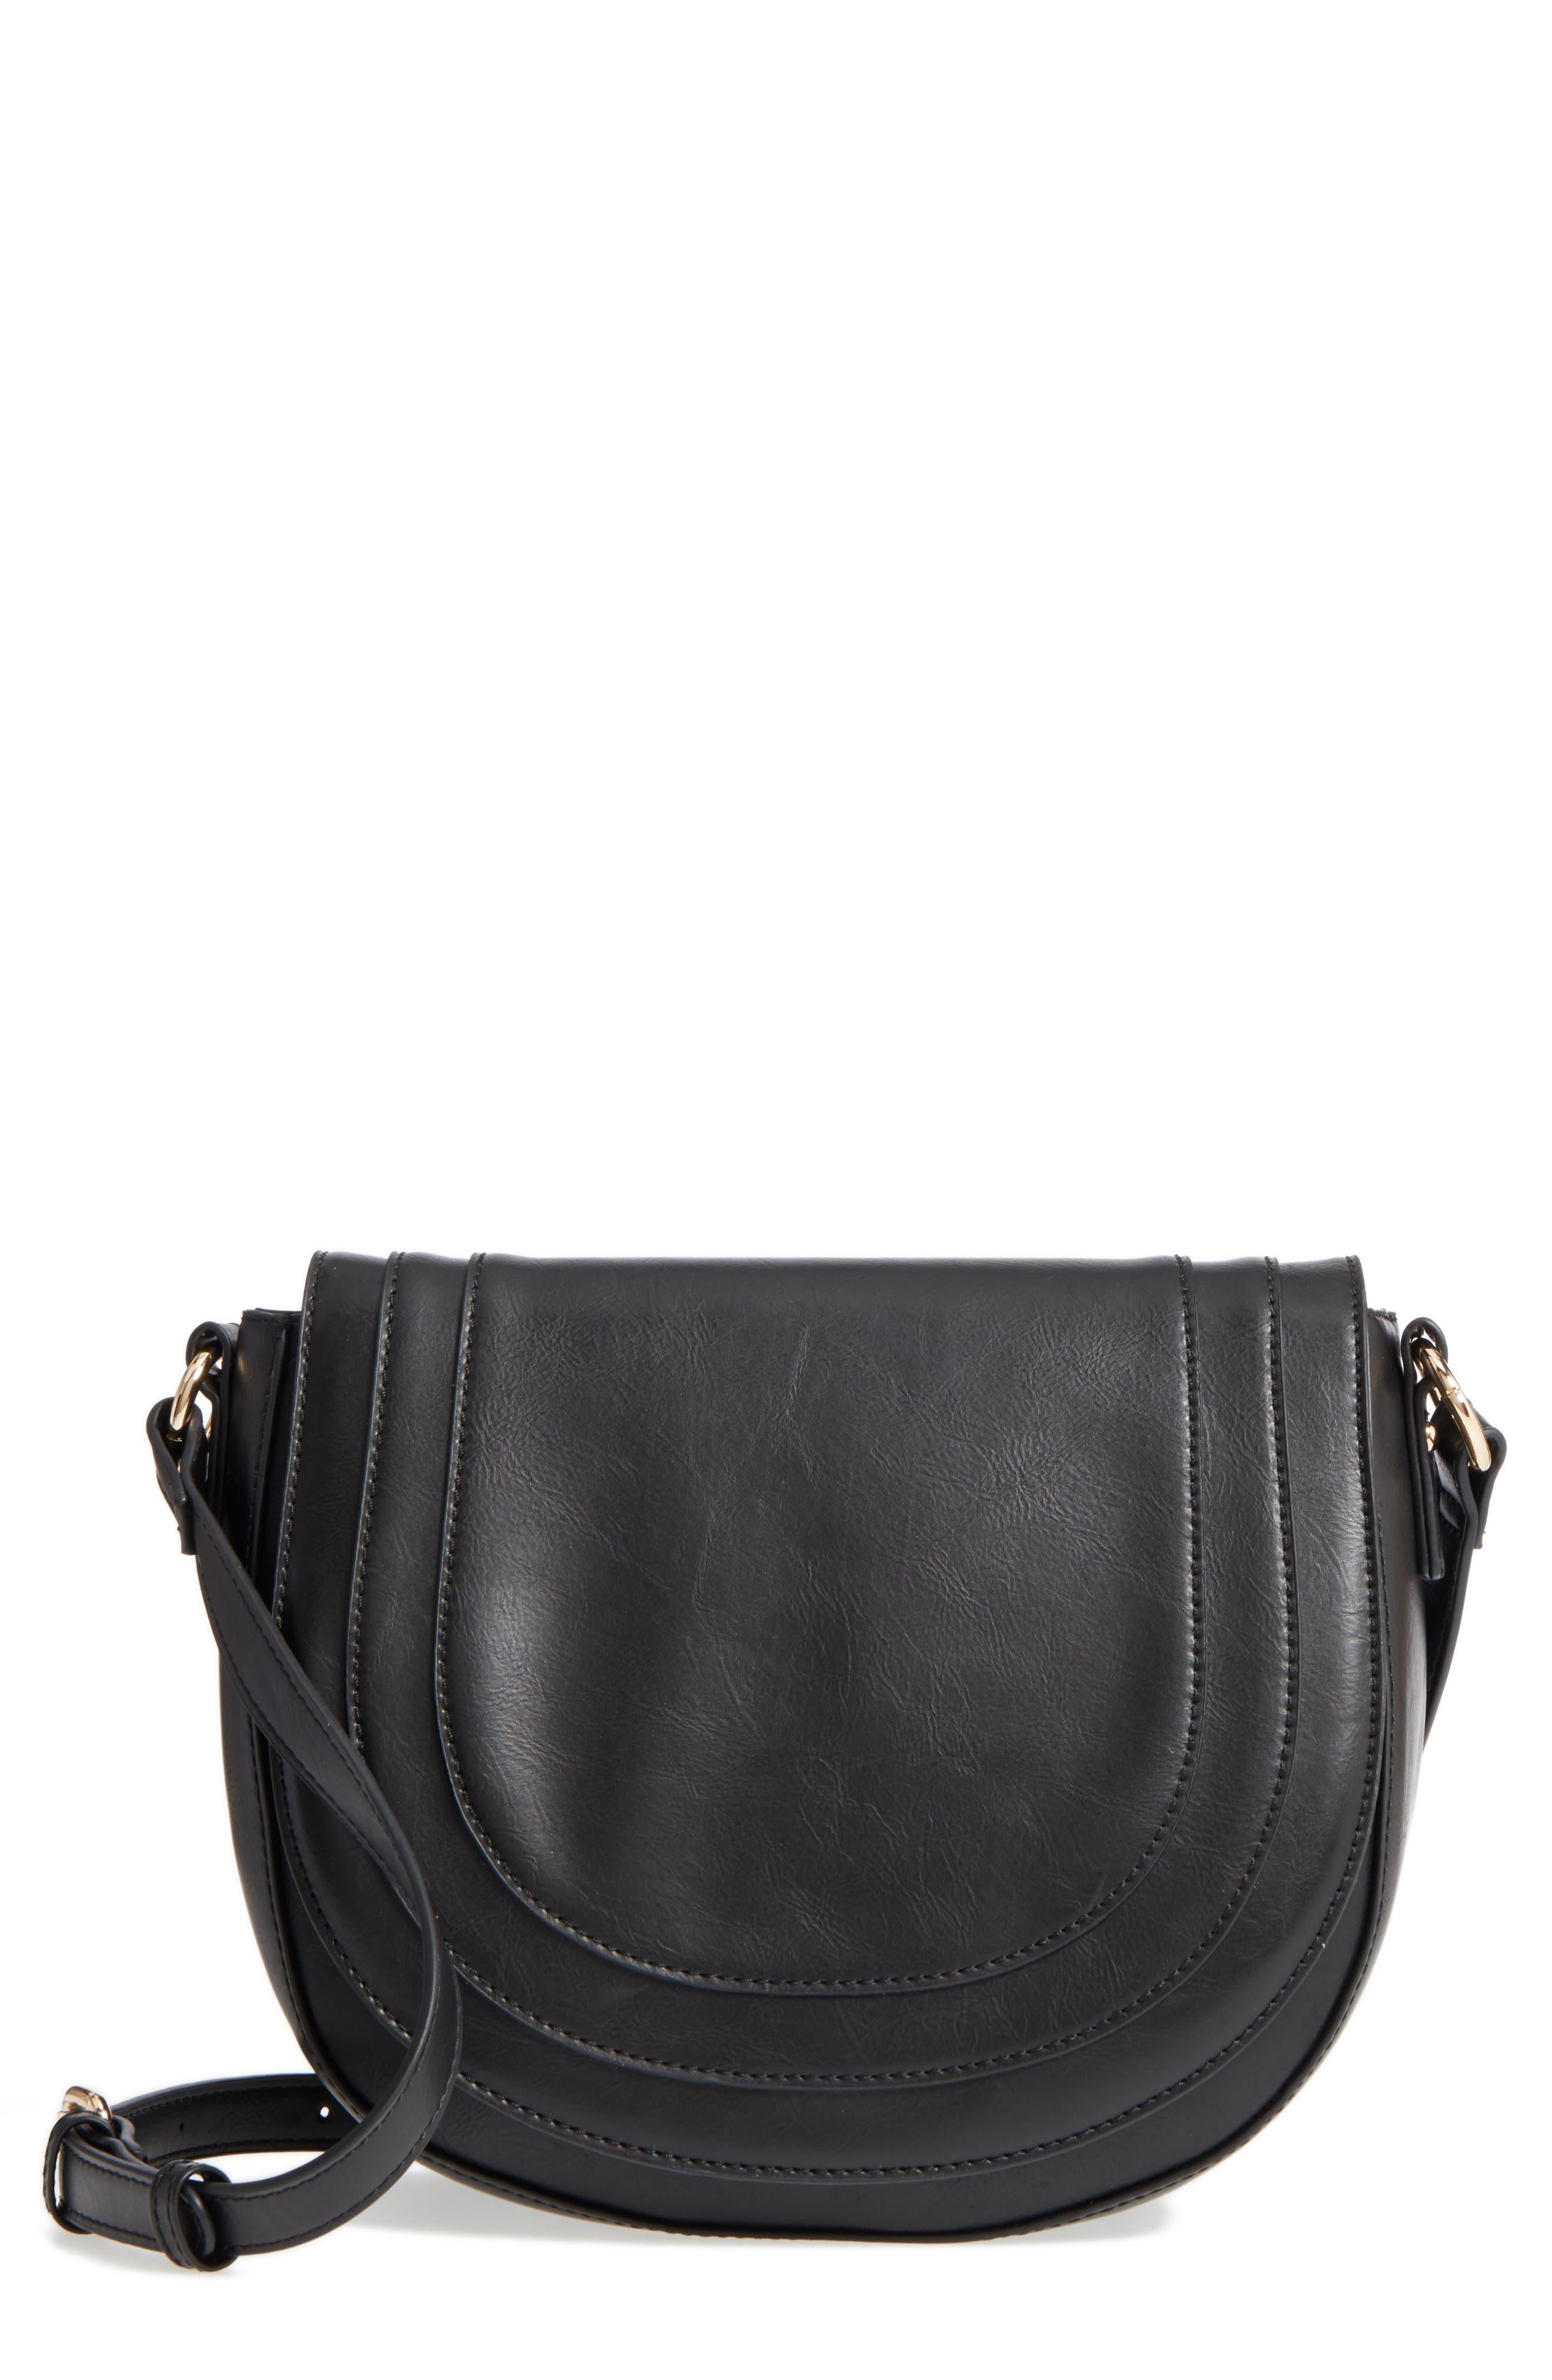 Alternate Image 1 Selected - Sole Society Piri Faux Leather Saddle Bag